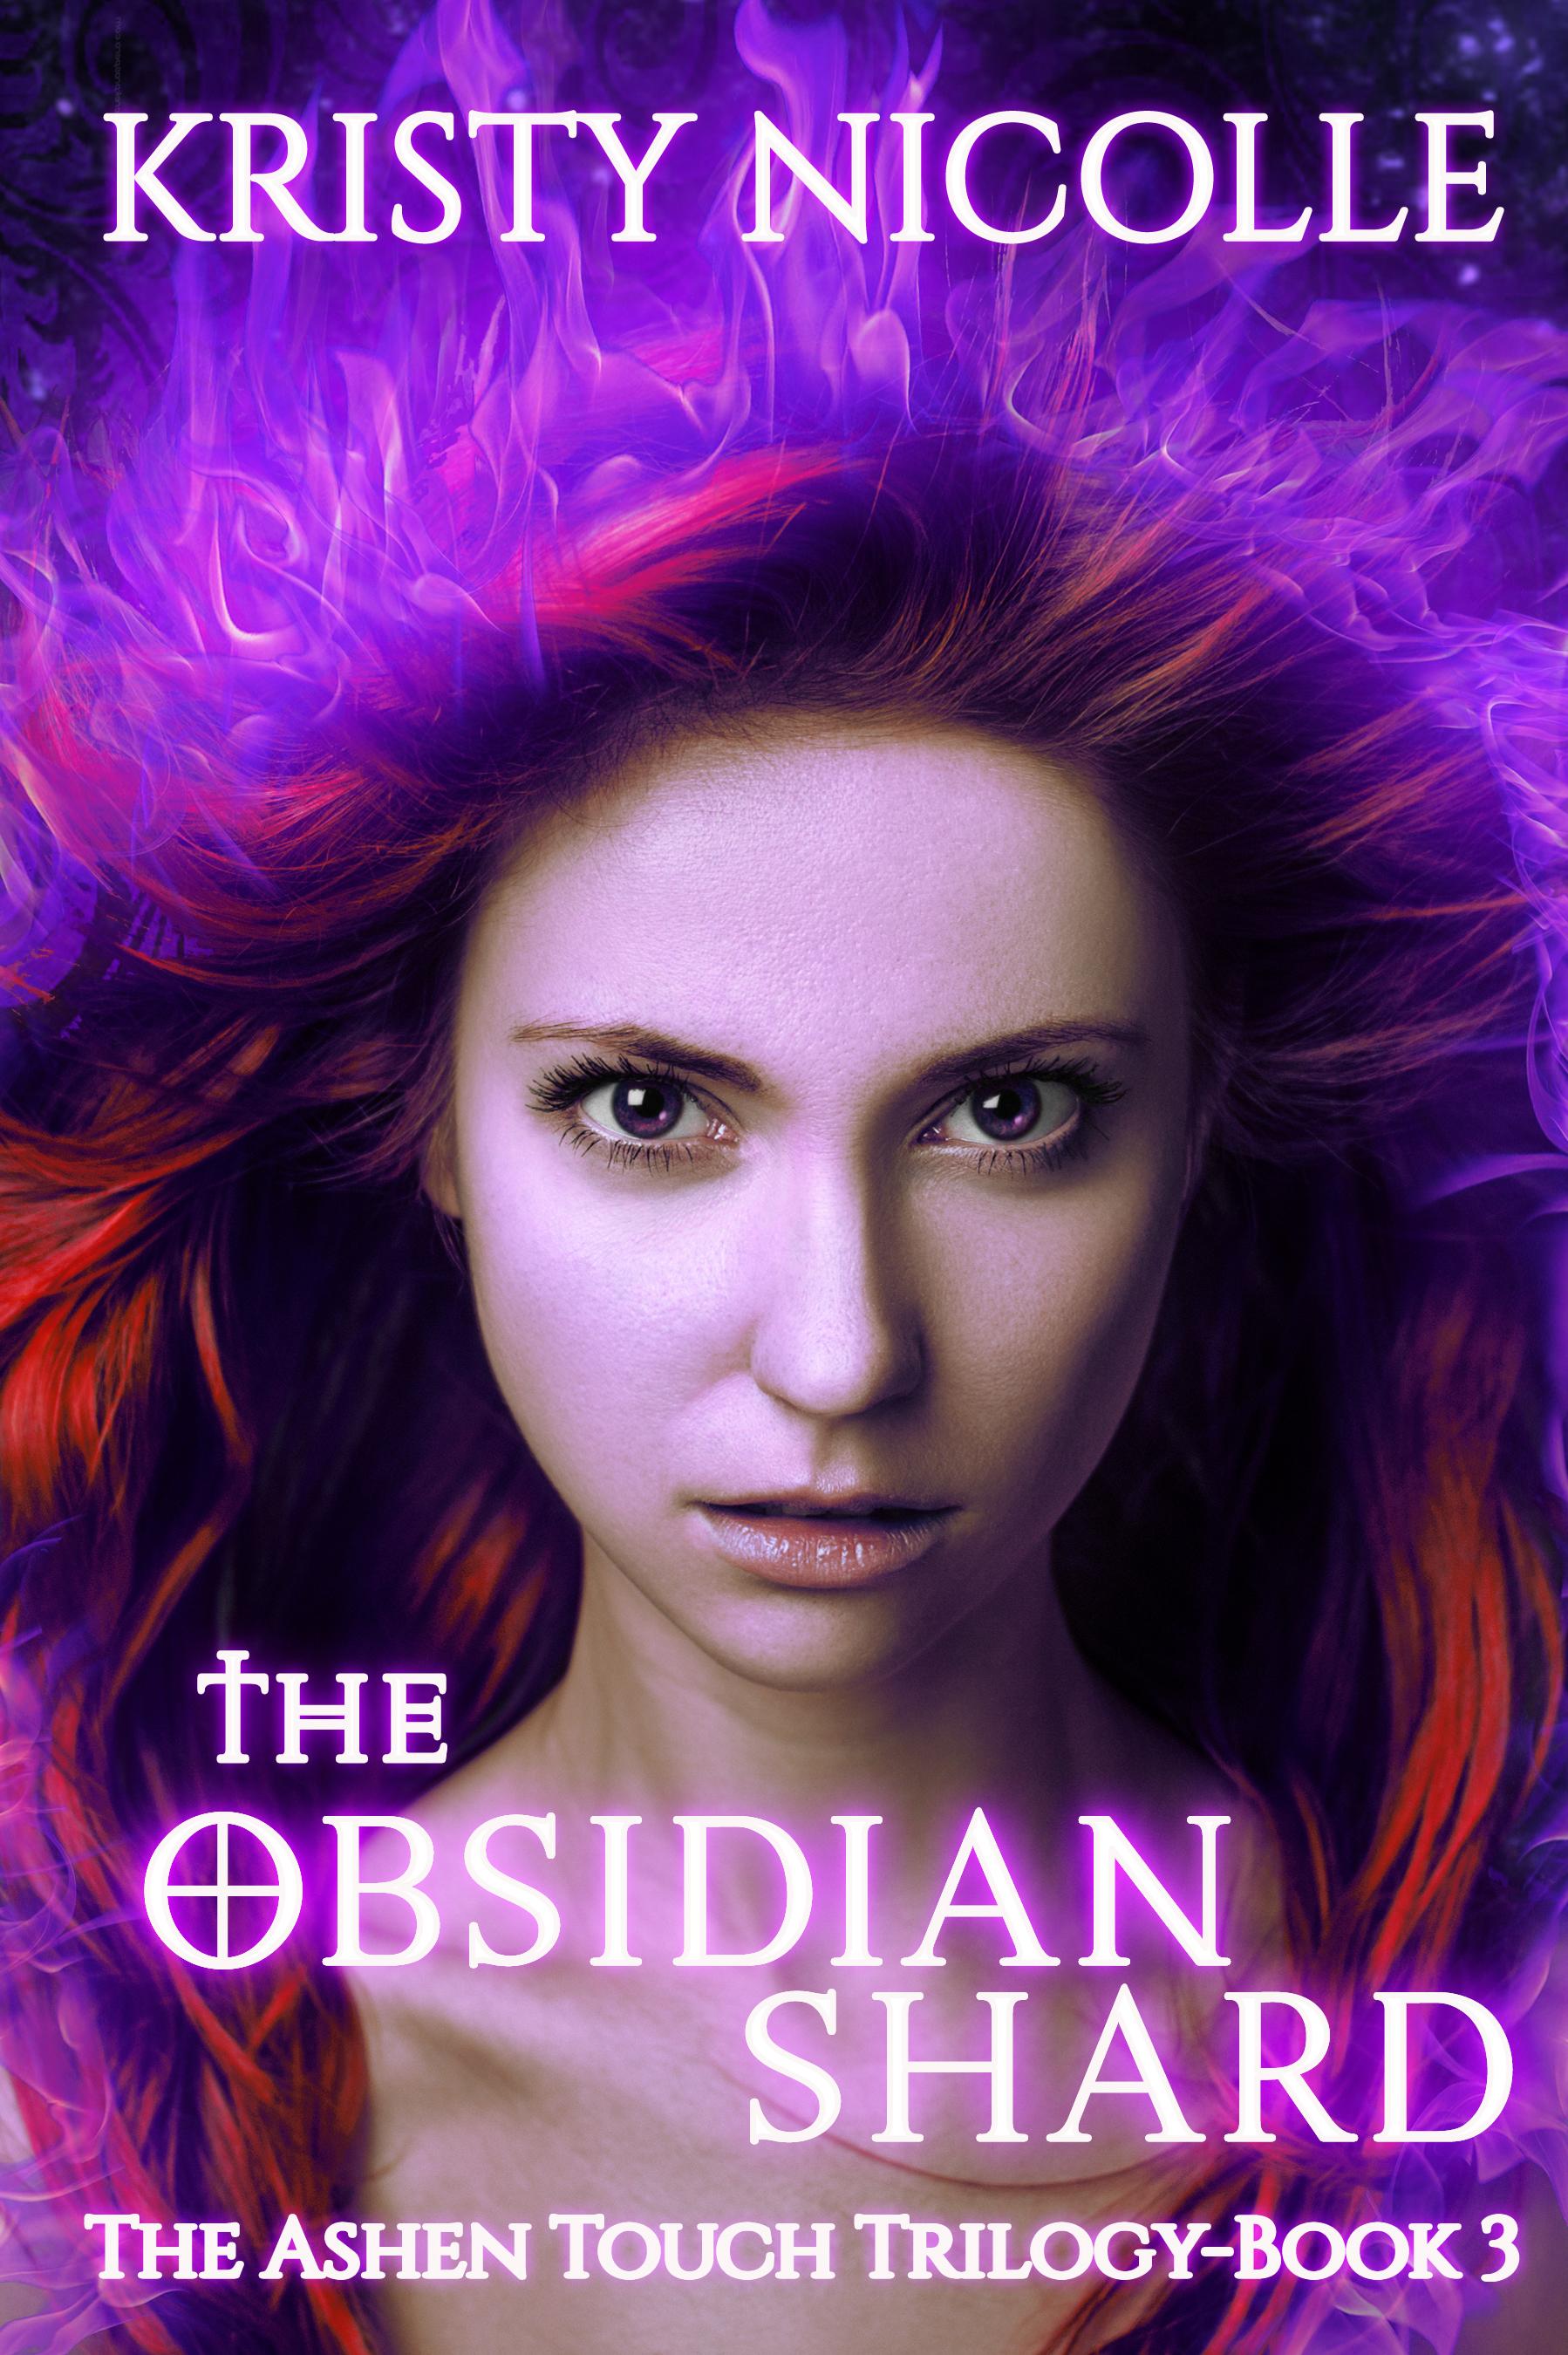 The Obsidian Shard- Dark Urban Fantasy Romance